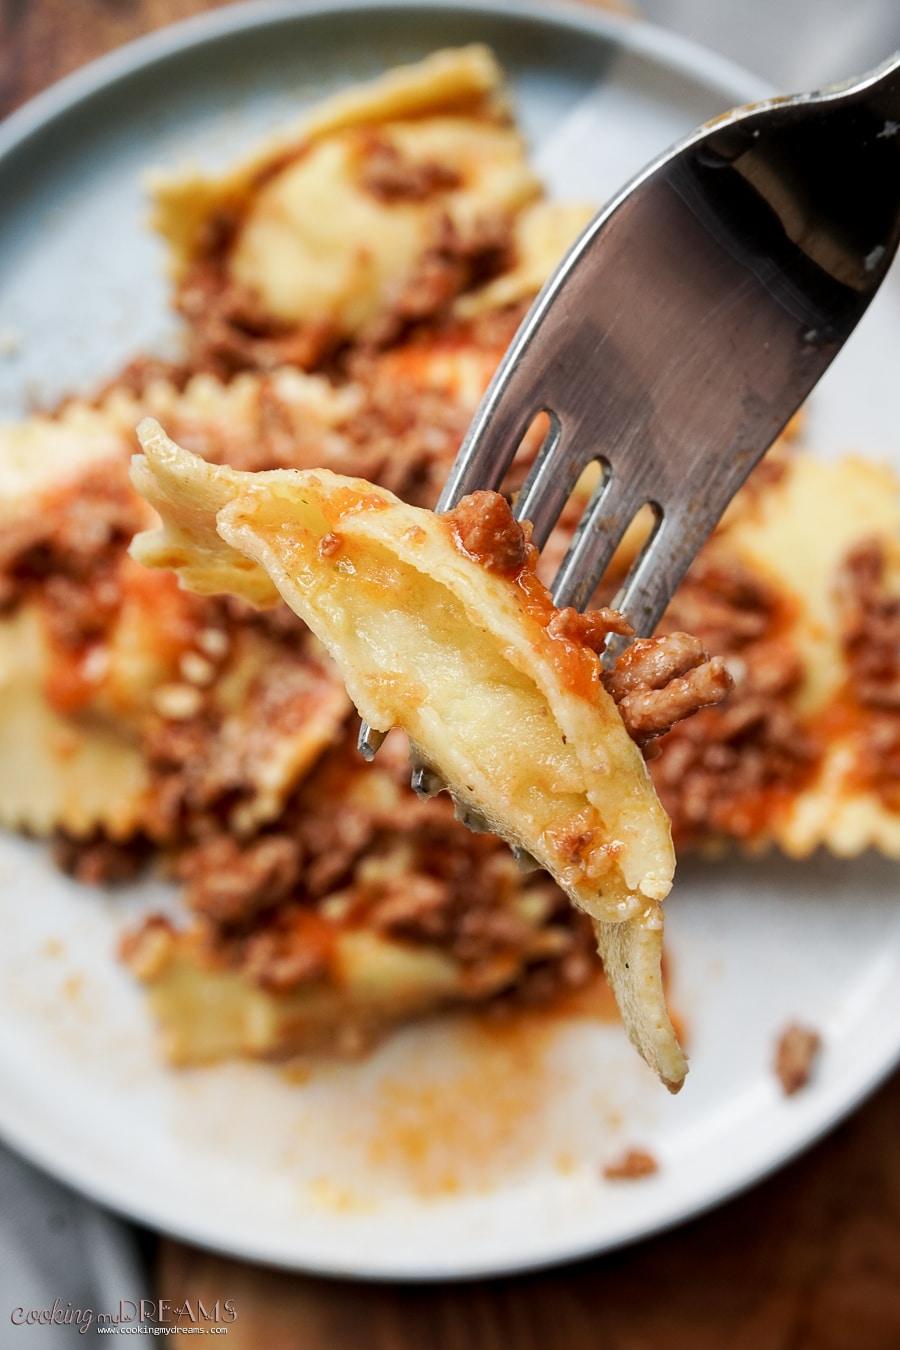 macro shot of half ravioli on a fork showing the potato filling